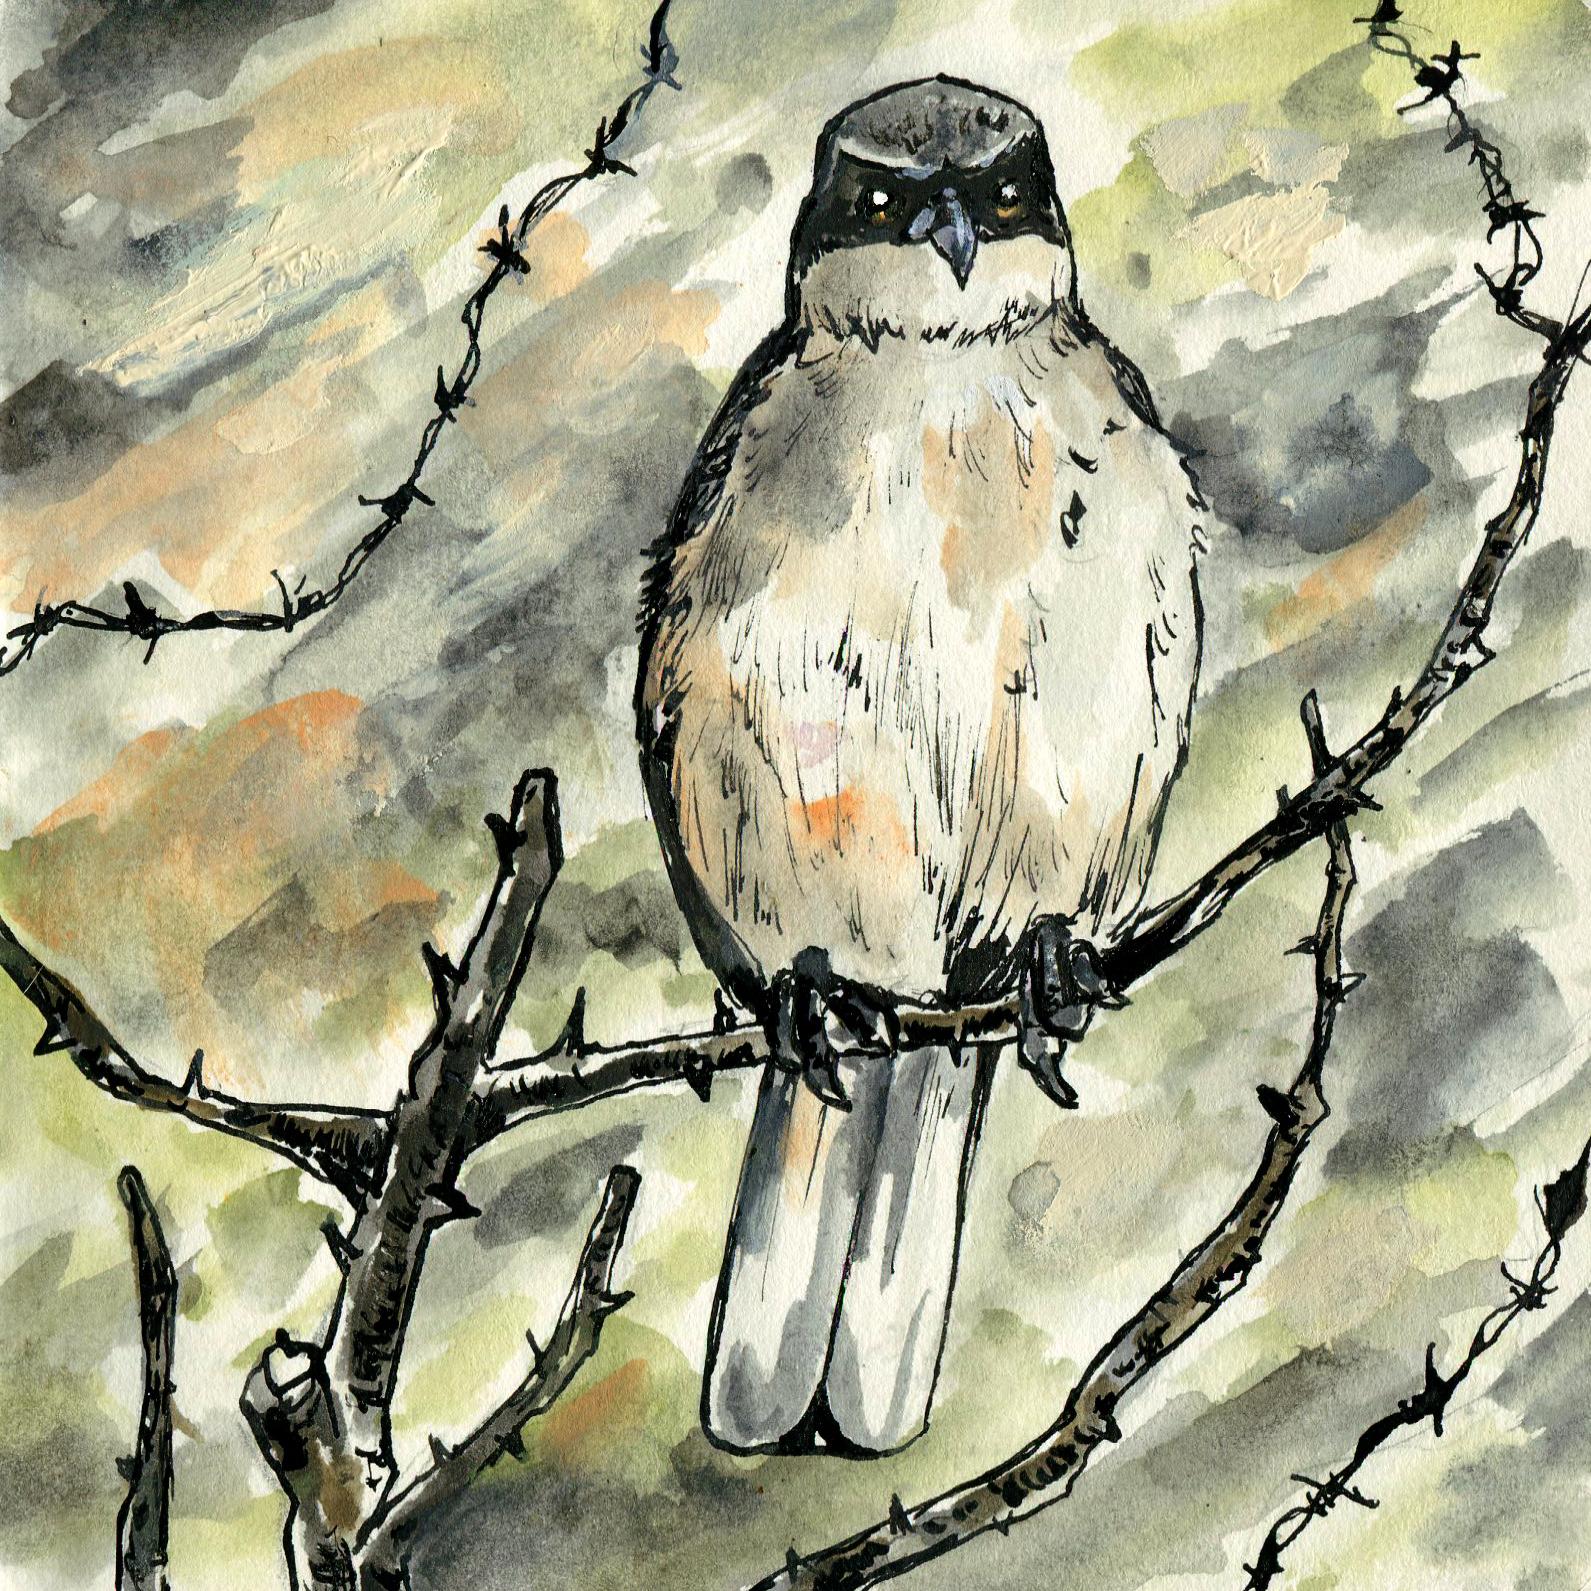 265. Loggerhead Shrike